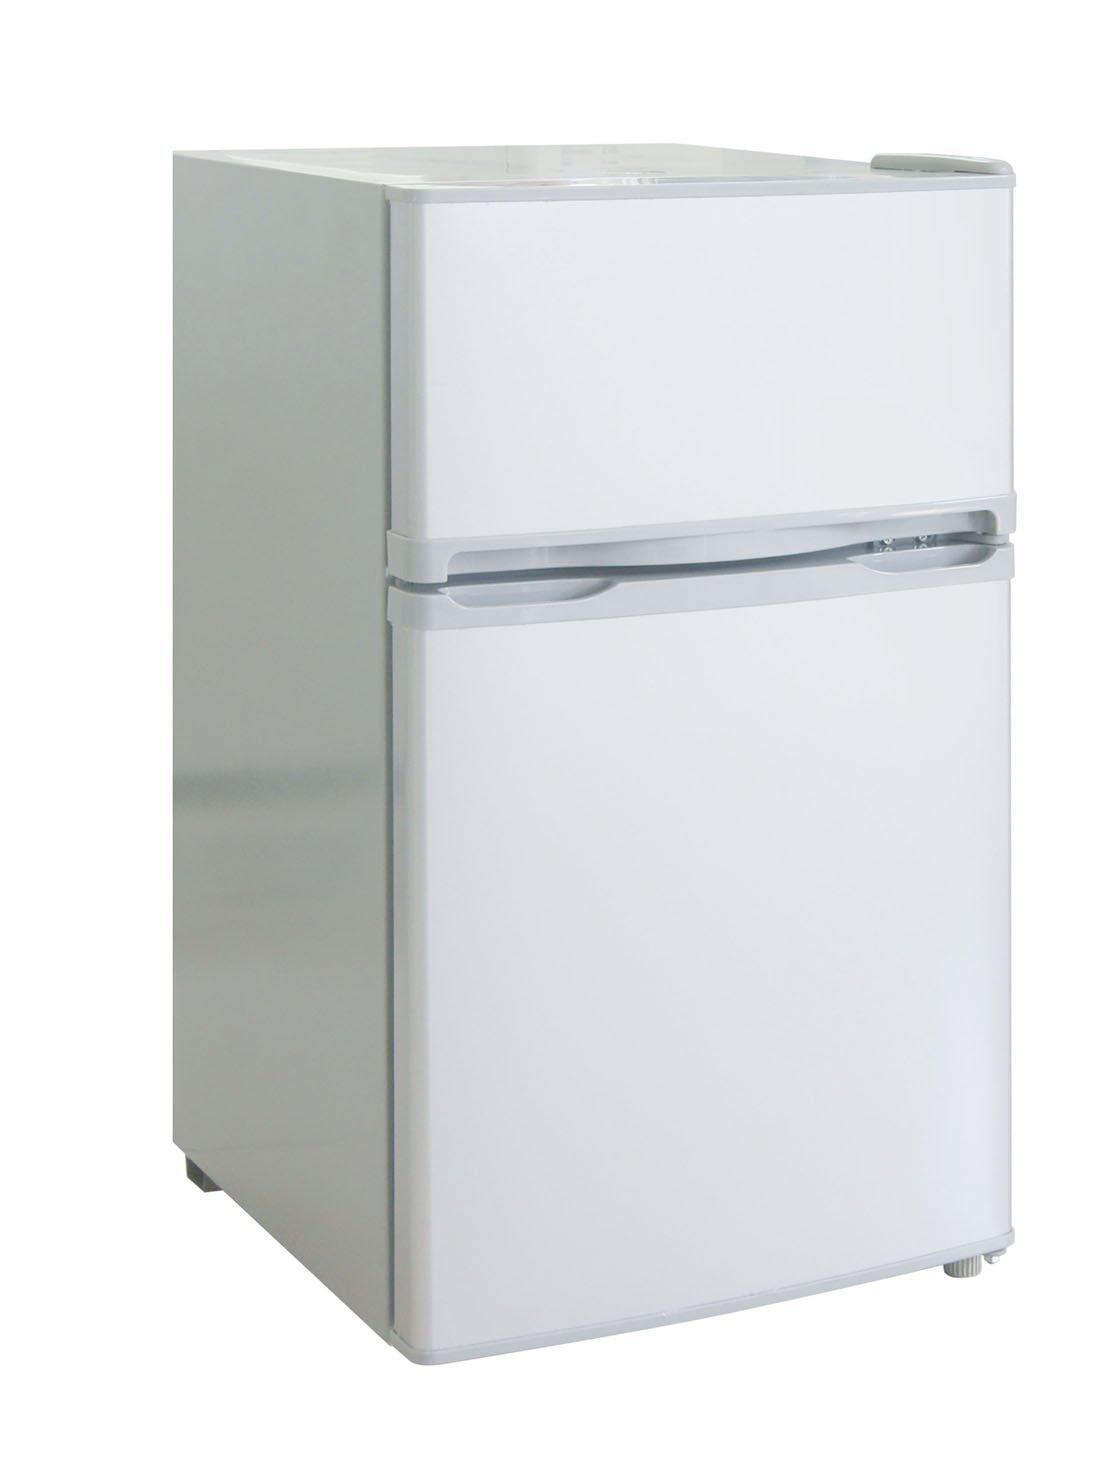 RCA-Igloo 3.2 Cubic Foot 2 Door Fridge and Freezer